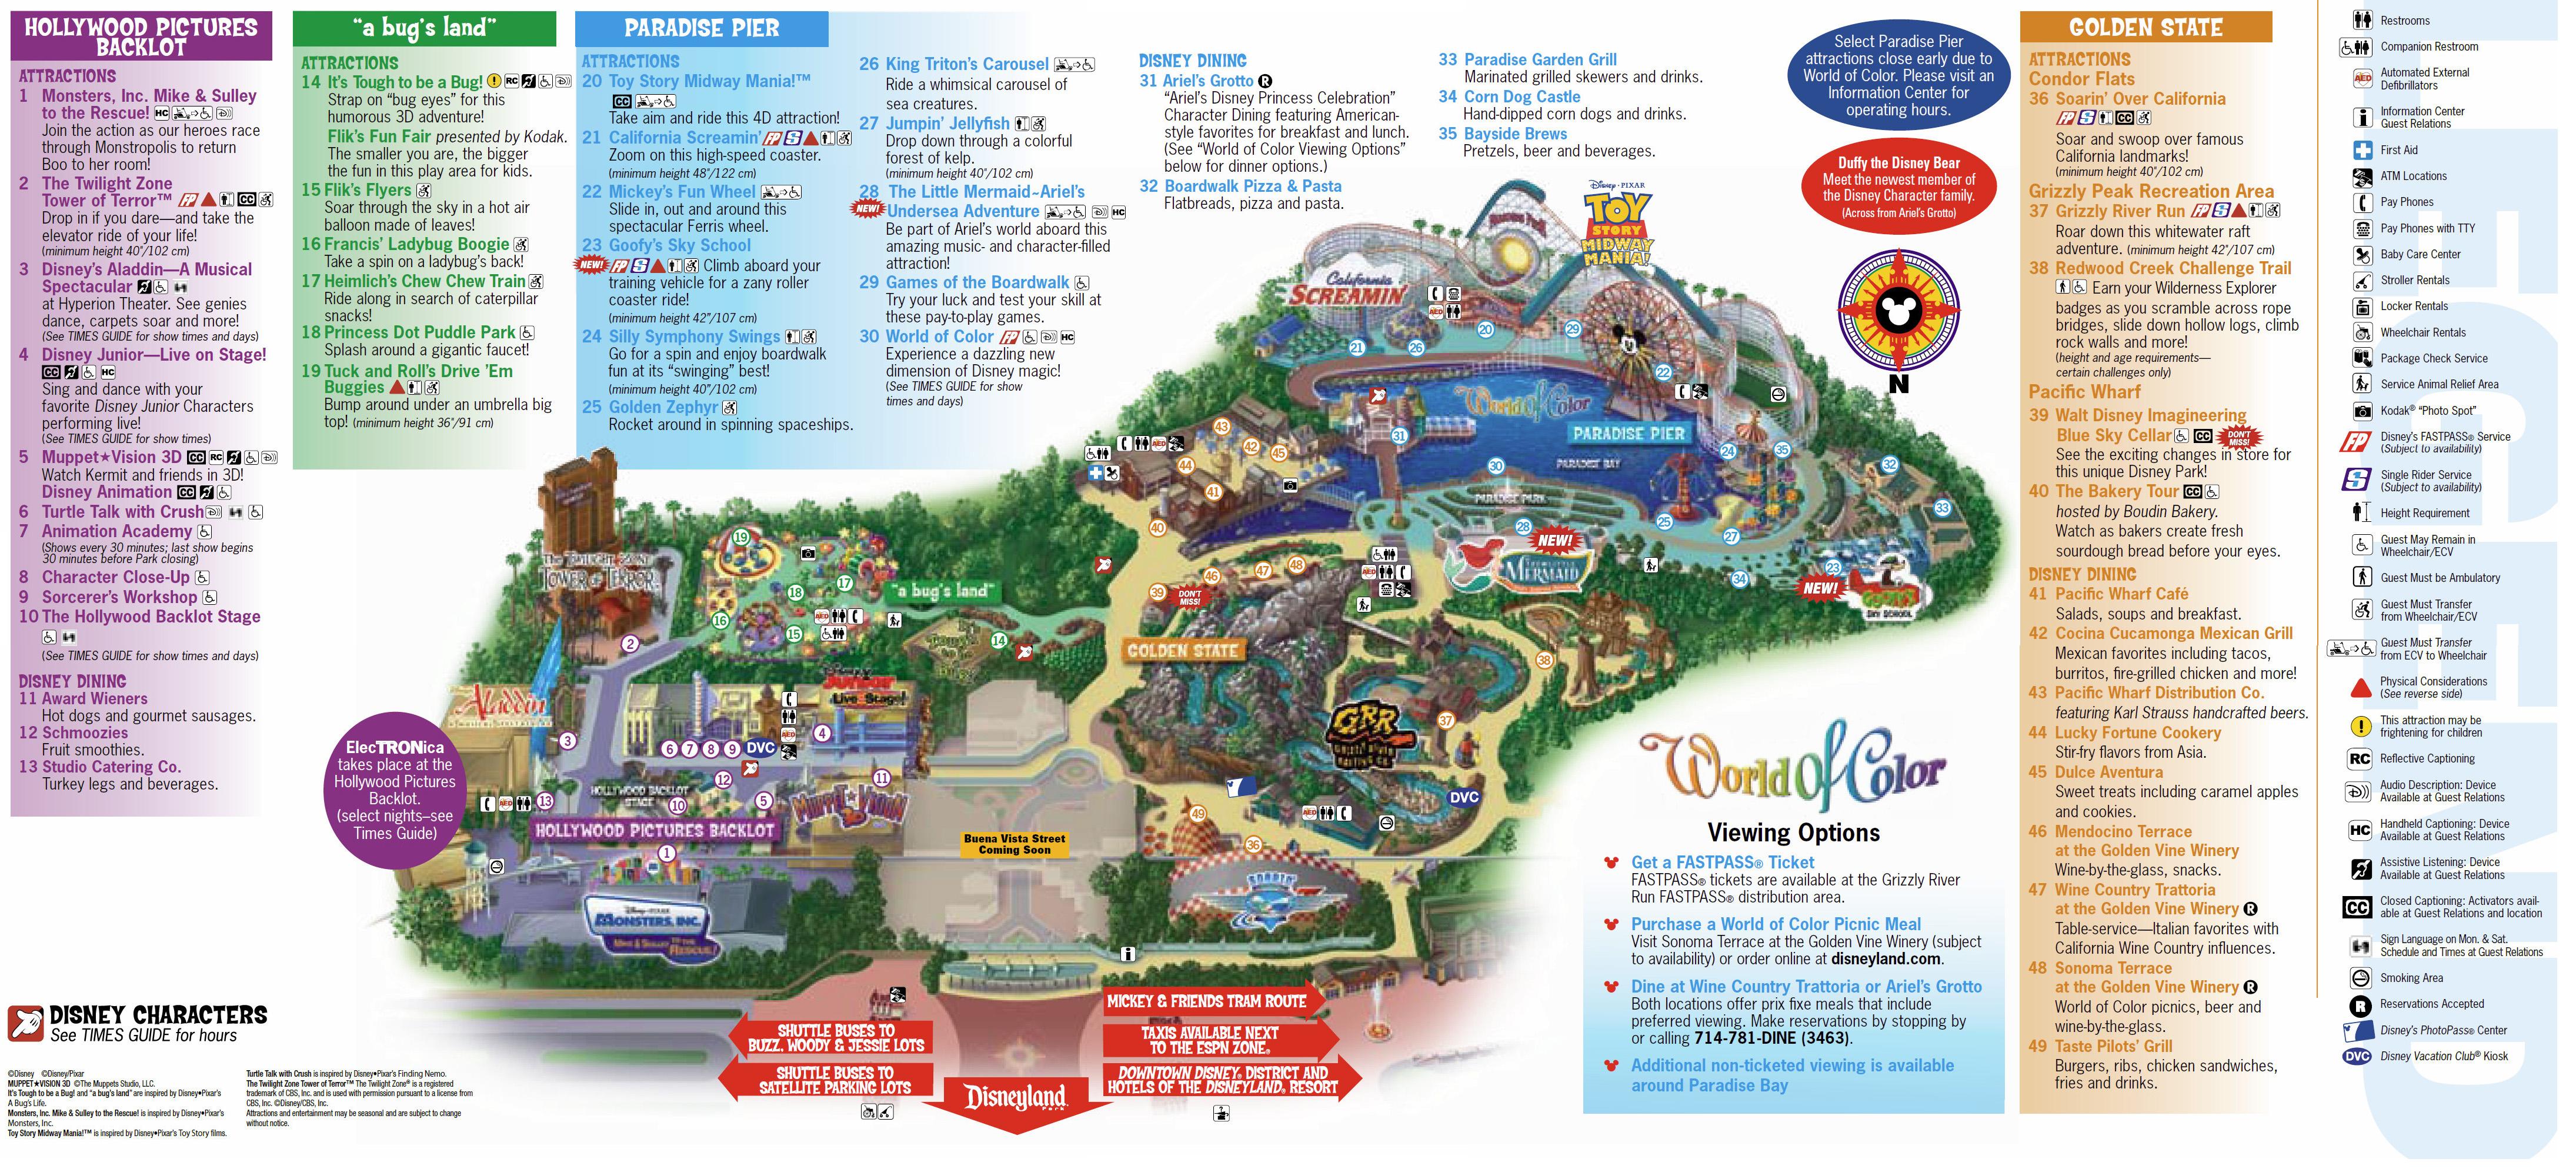 Disney Map Map Of California Springs Downtown Disney California Map - Disney California Map